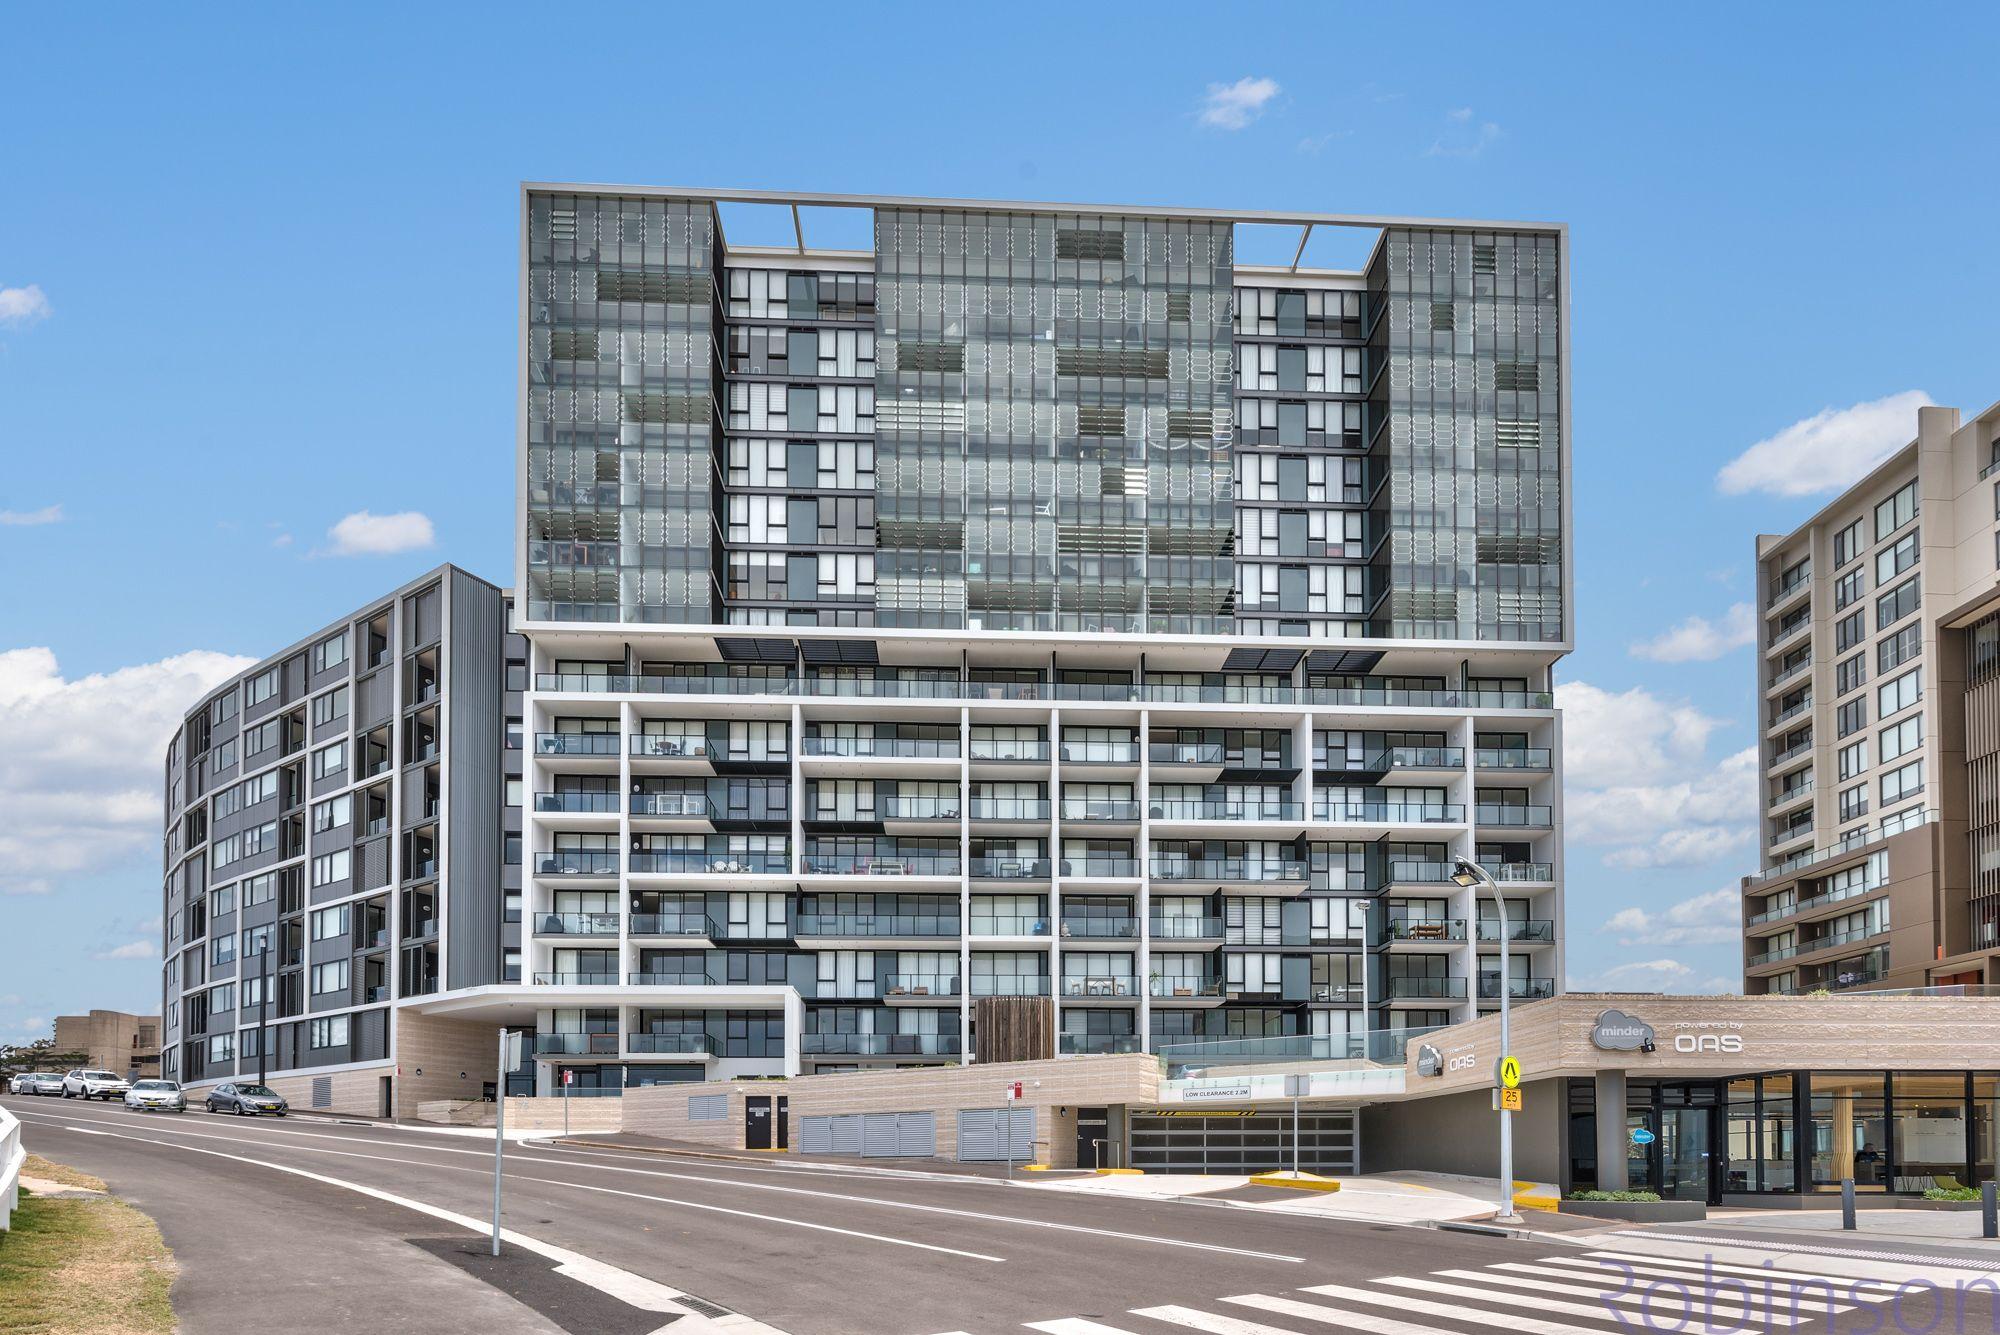 Level 13/A1305/75 Shortland Esplanade, Newcastle